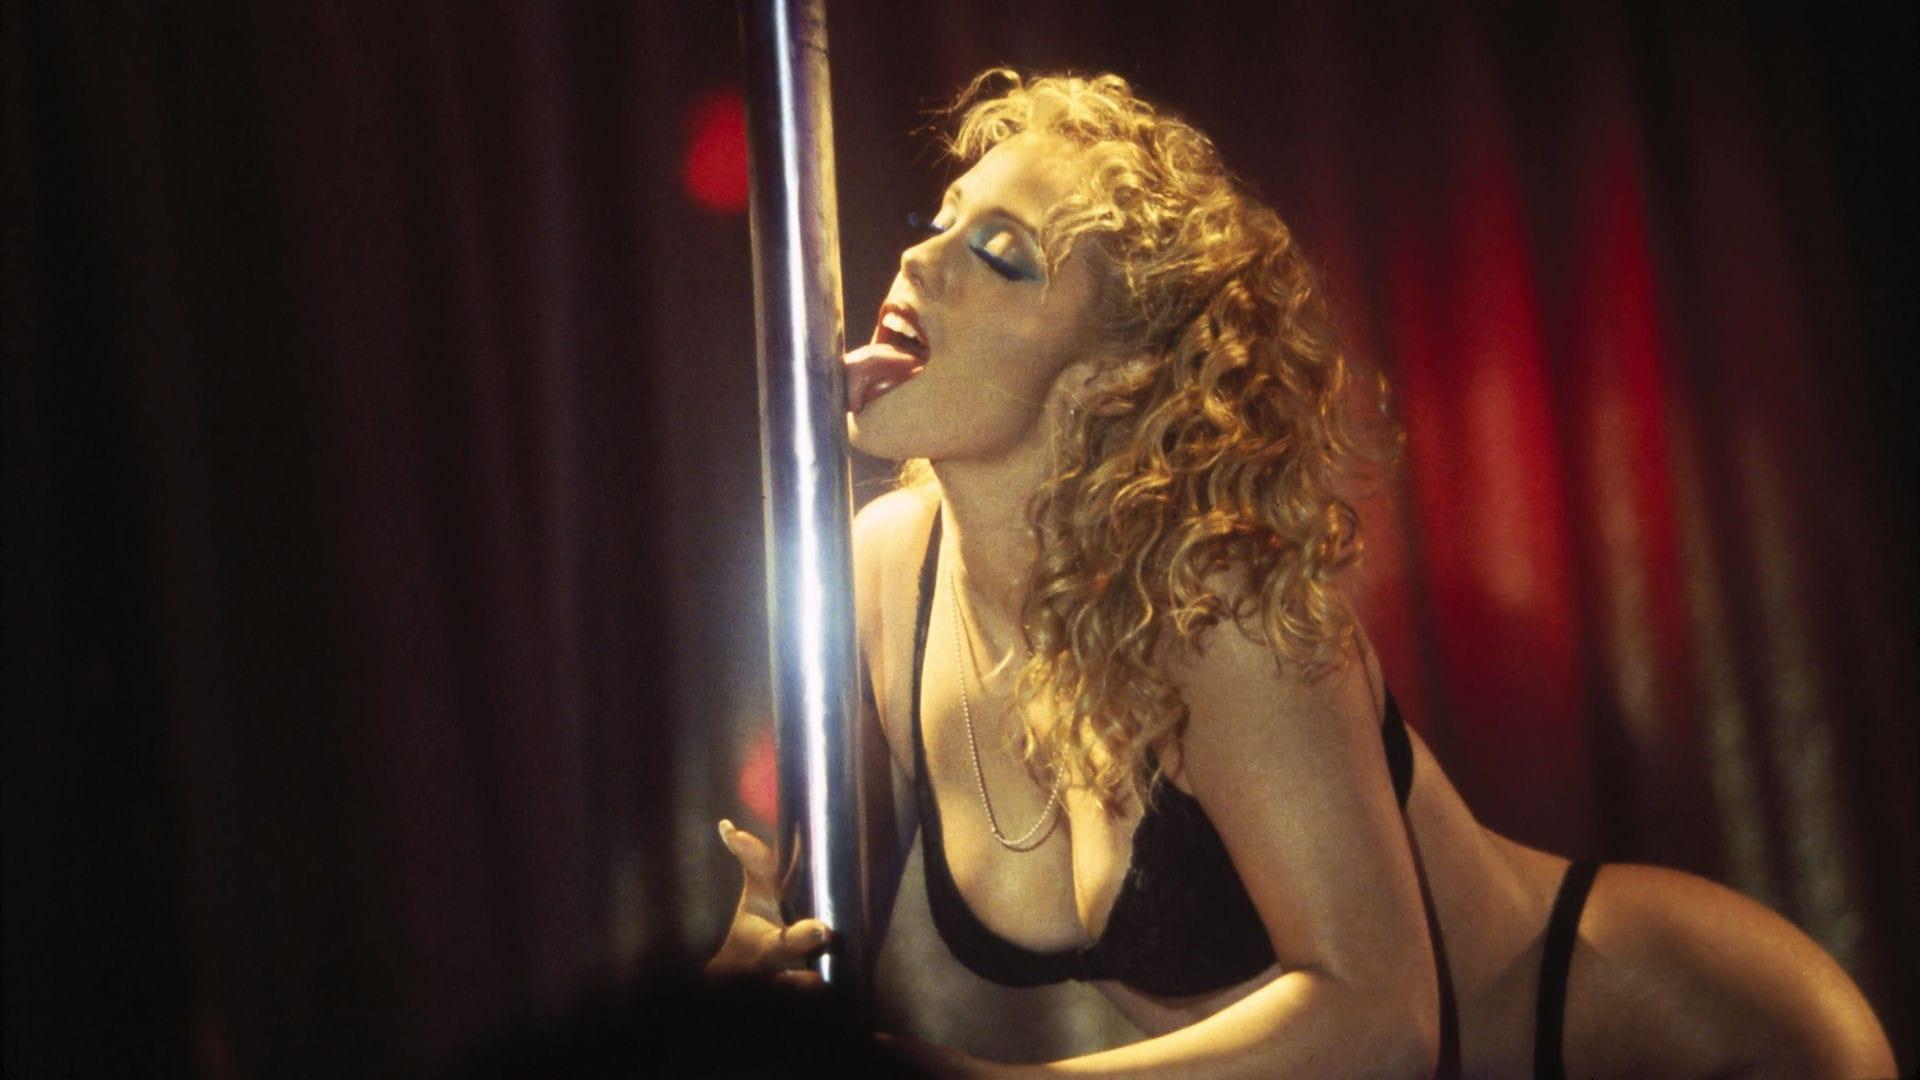 Showgirls backdrop